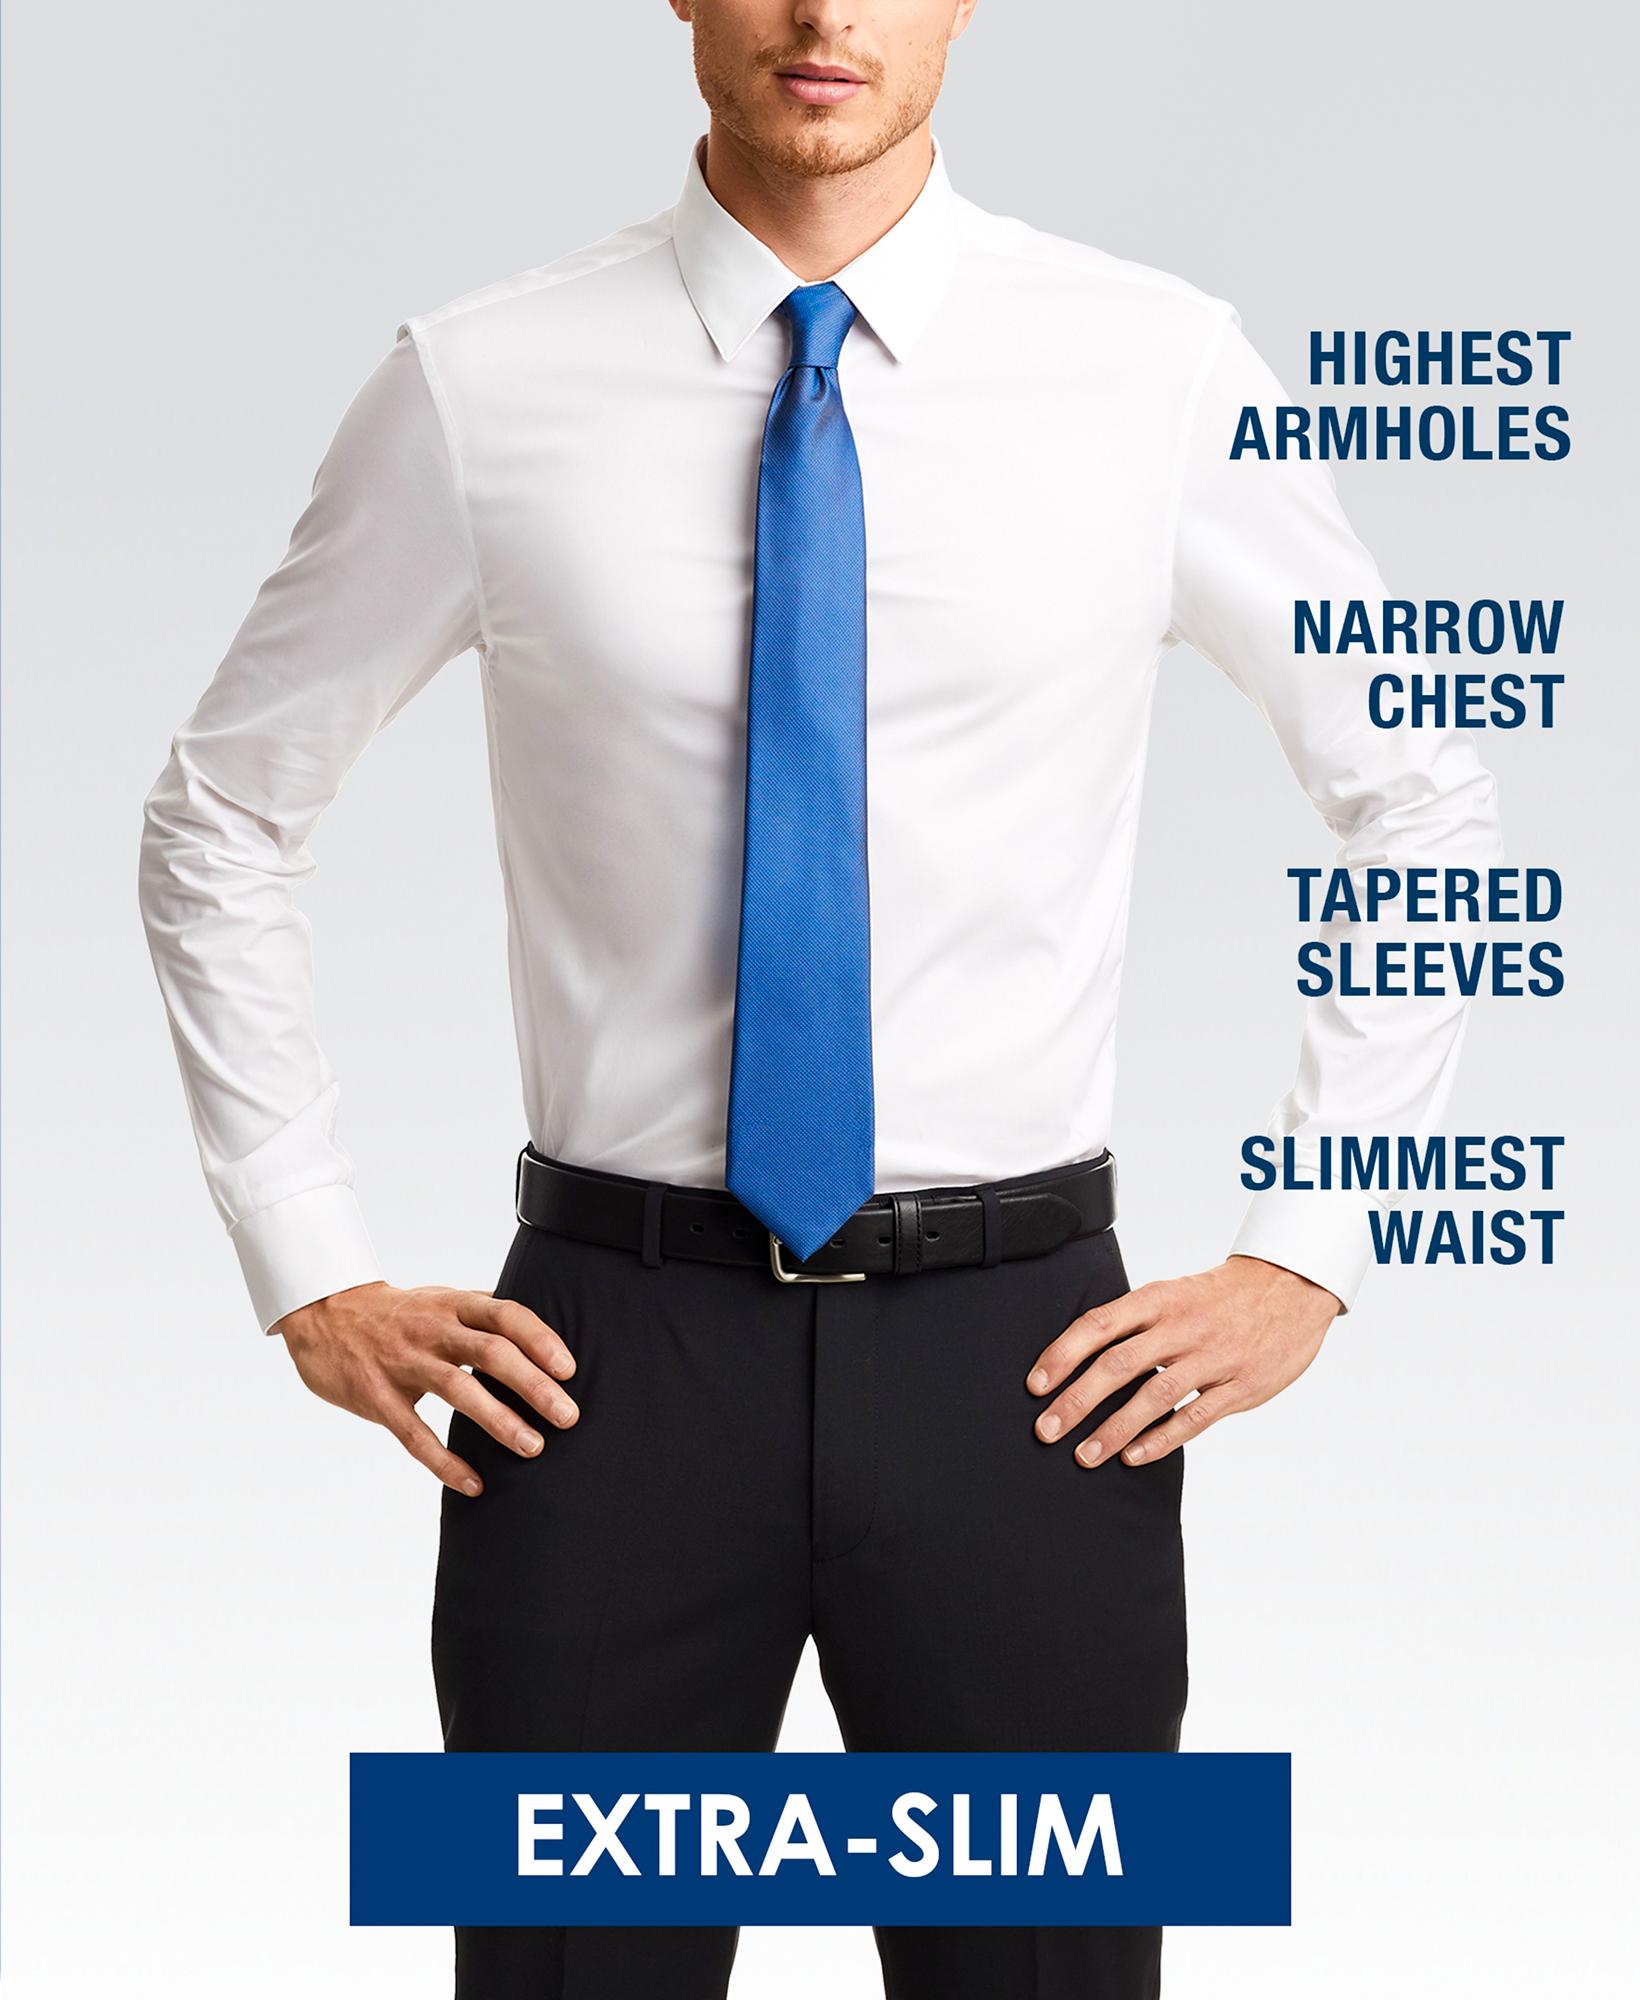 Extra-slim (skinny) fit dress shirt style